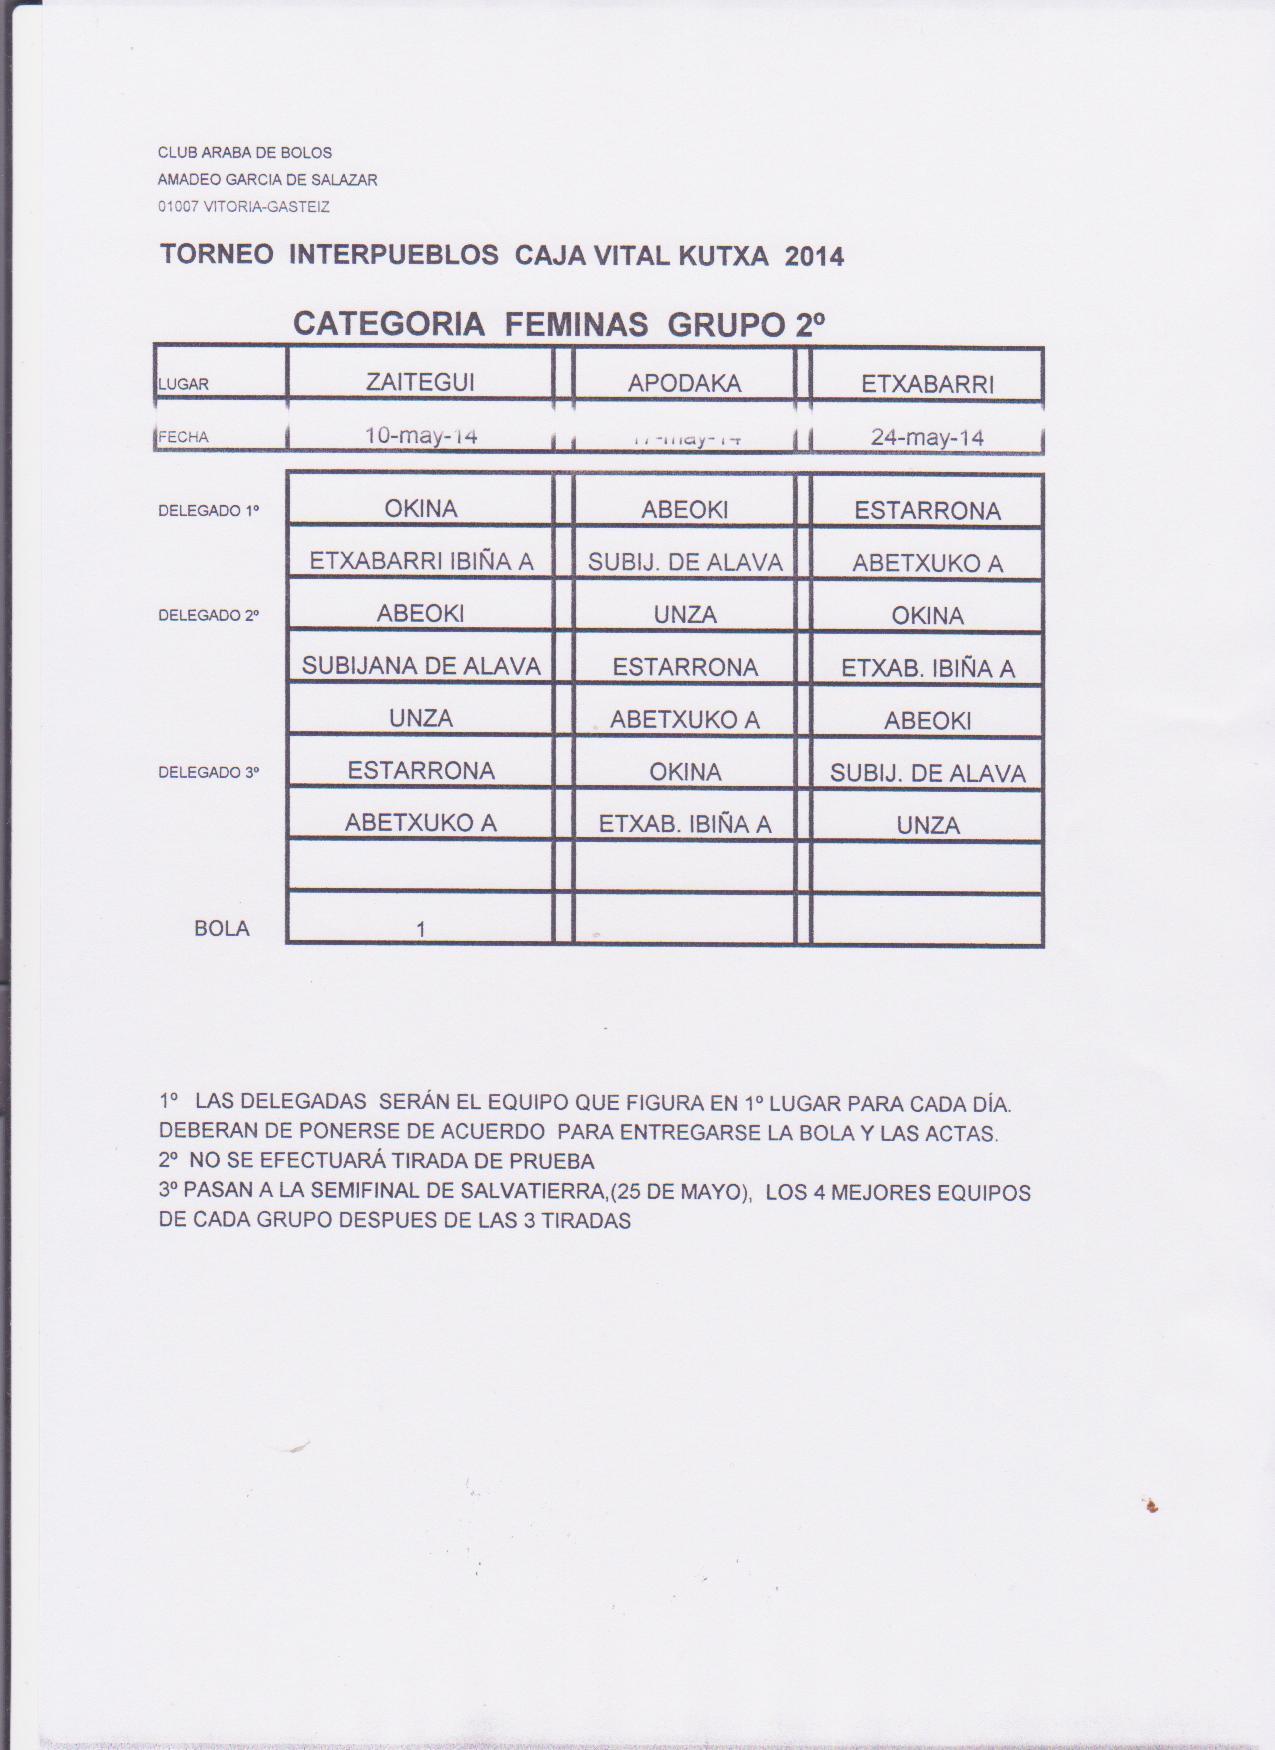 Sorteo interpueblos femenino 2014 2